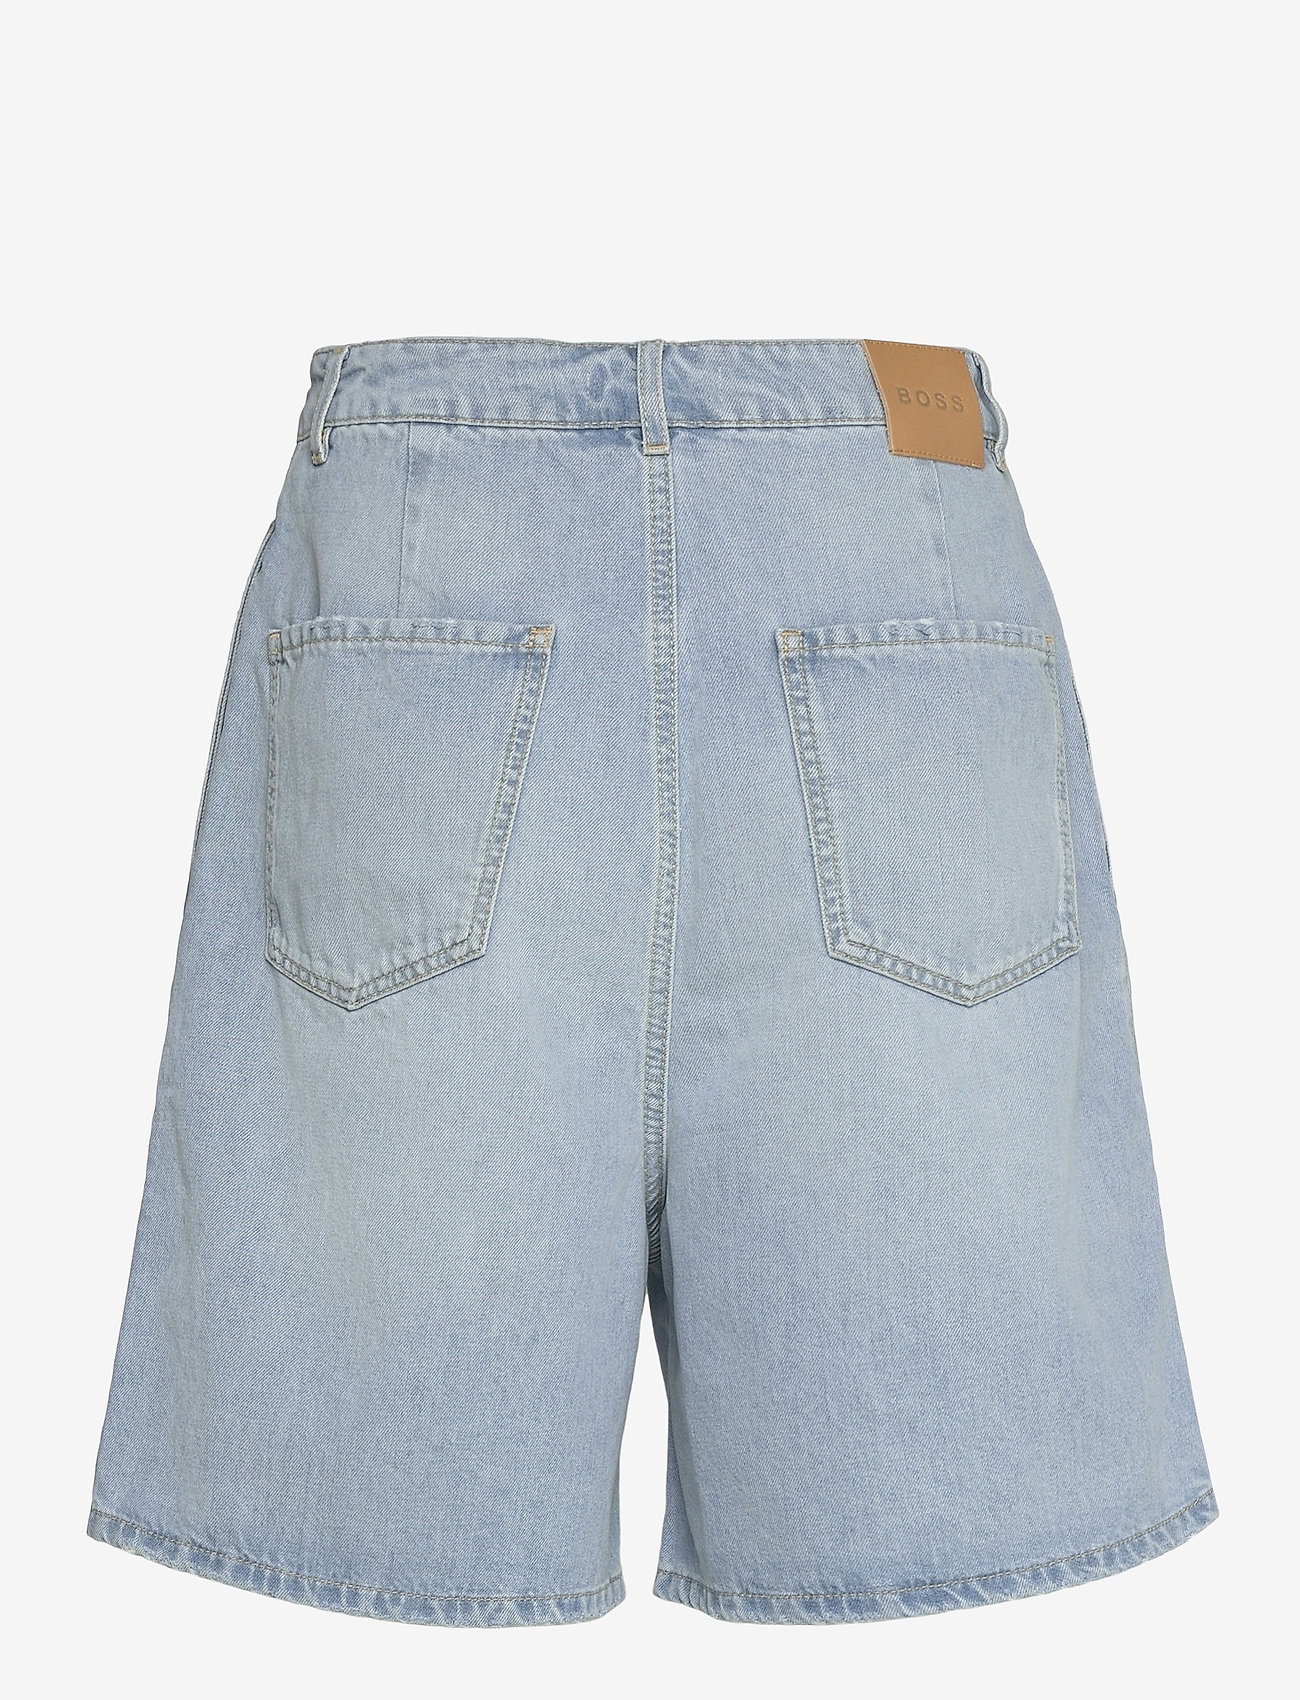 BOSS - DENIM SHORTS 1.0 - jeansshorts - medium blue - 1